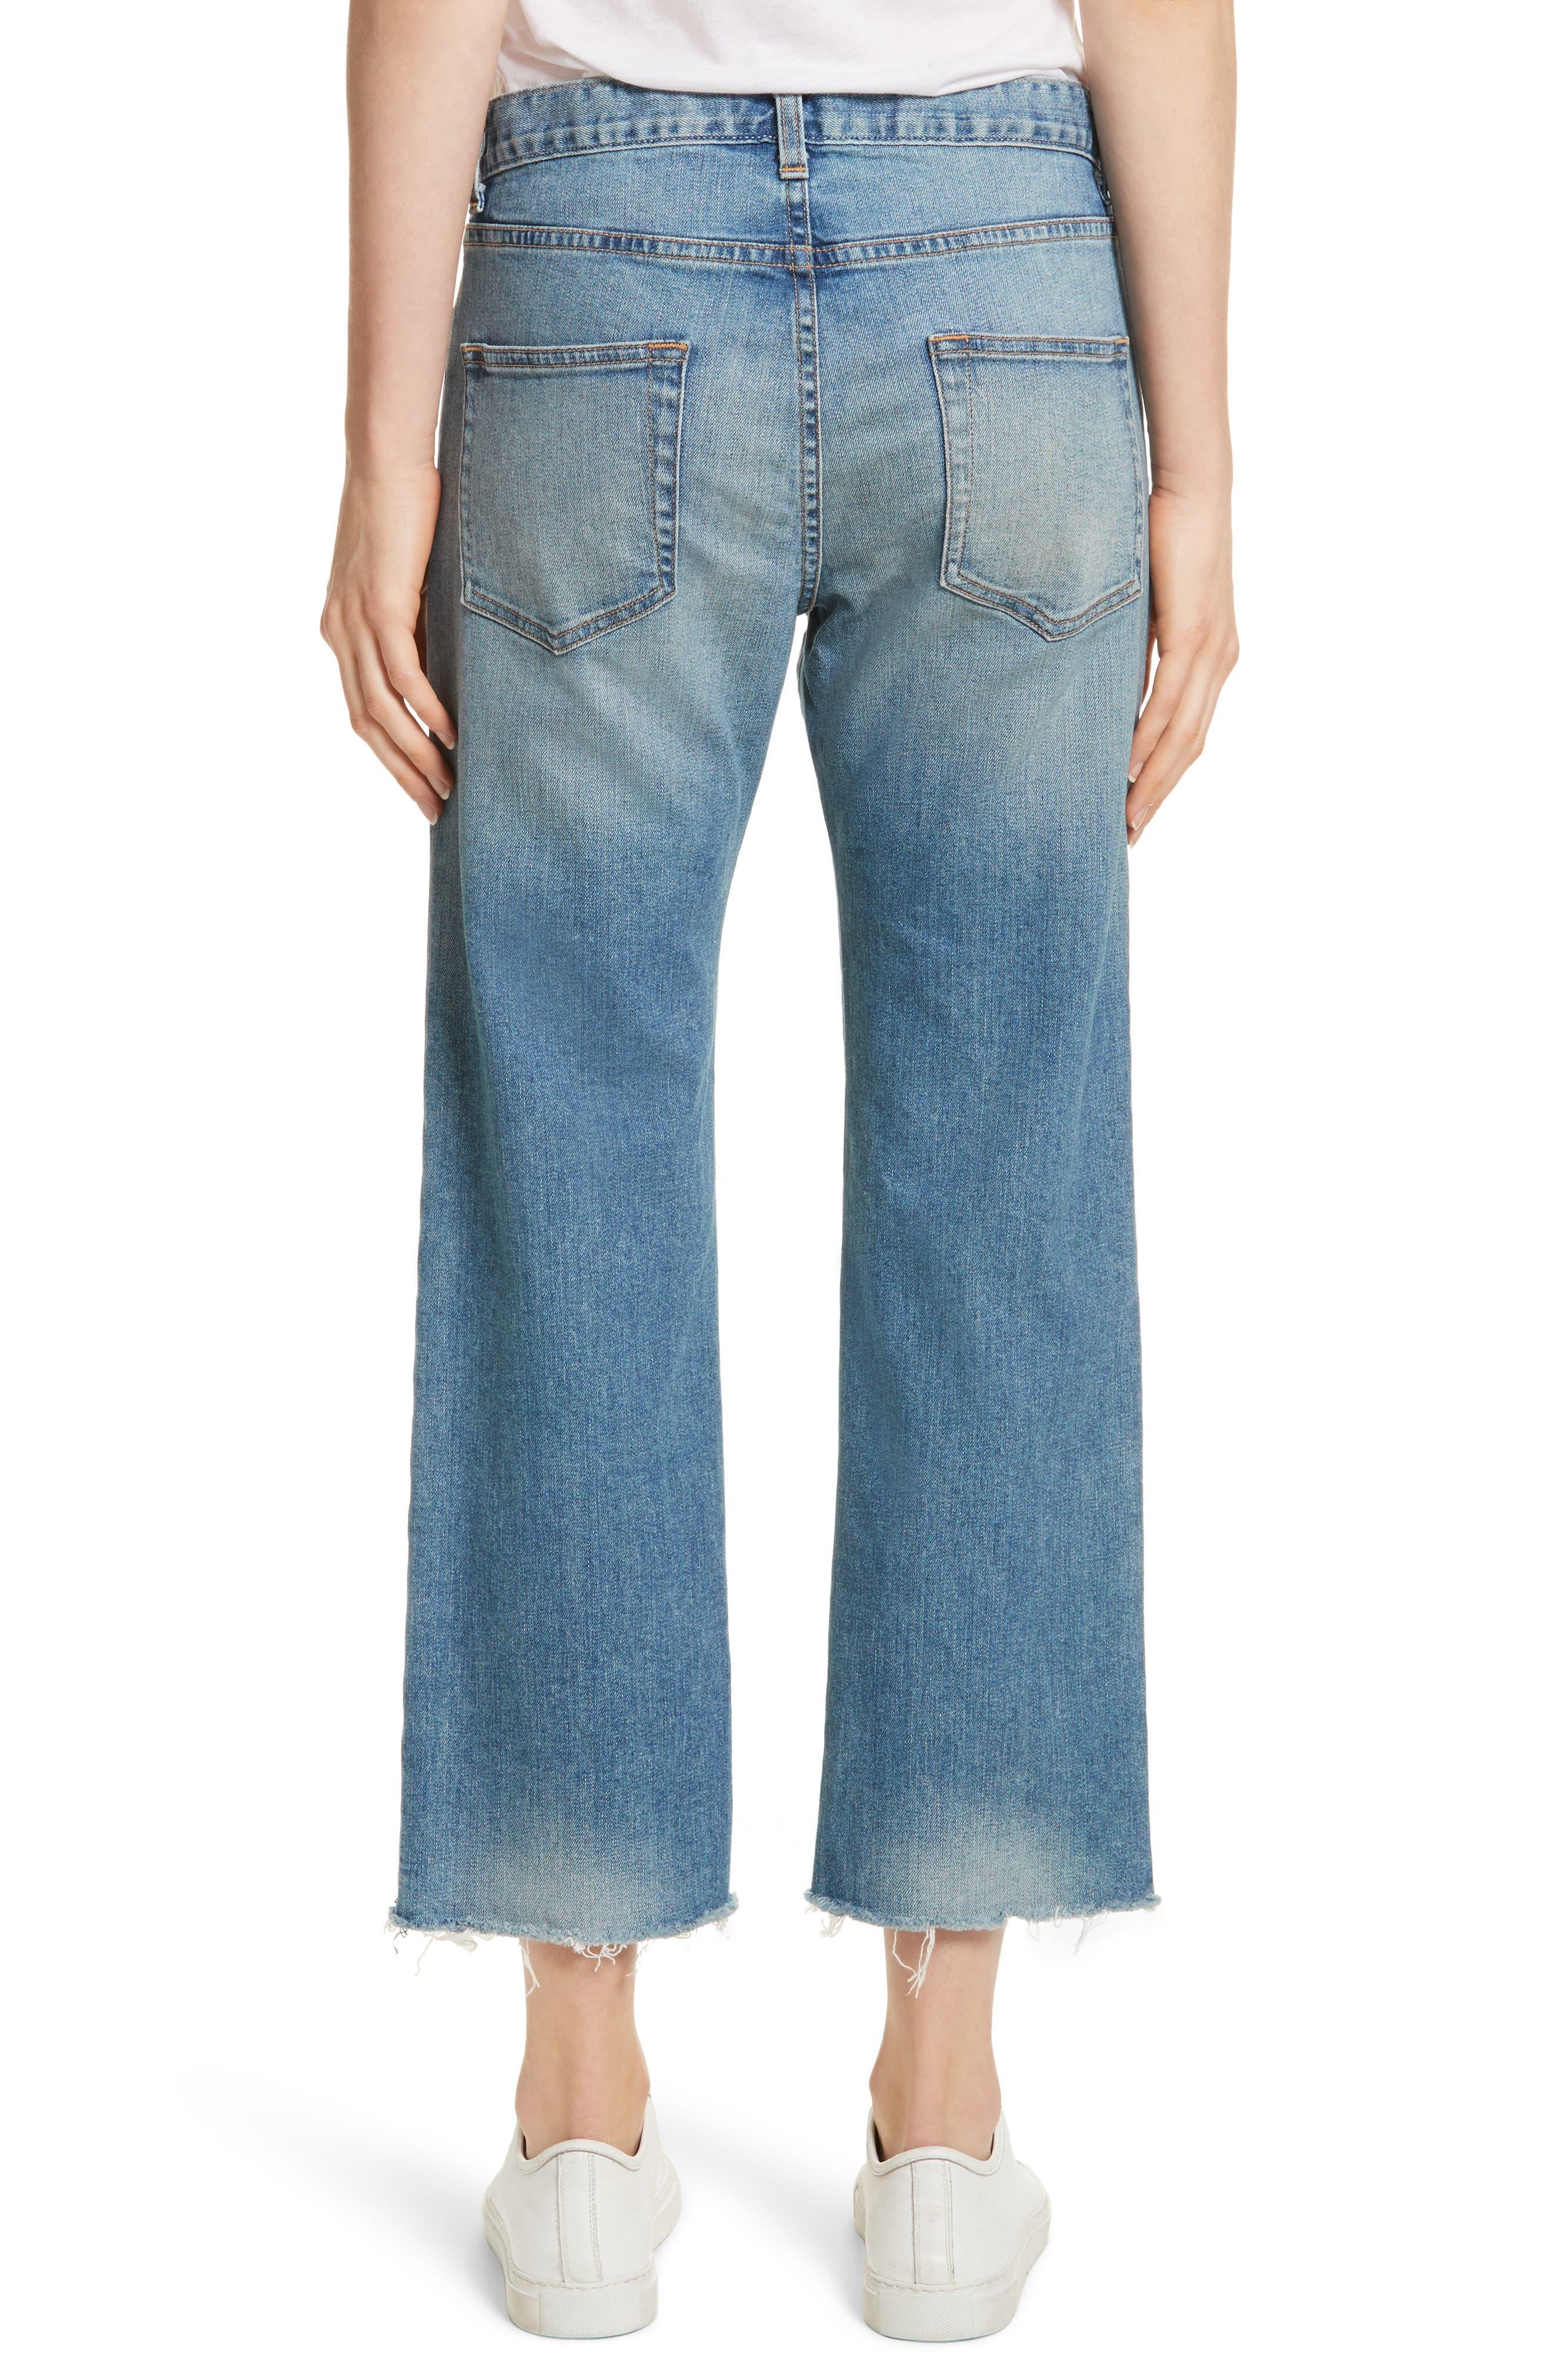 NILI LOTAN,                             Raw Edge Crop Boyfriend Jeans,                             Alternate thumbnail 2, color,                             VENICE WASH